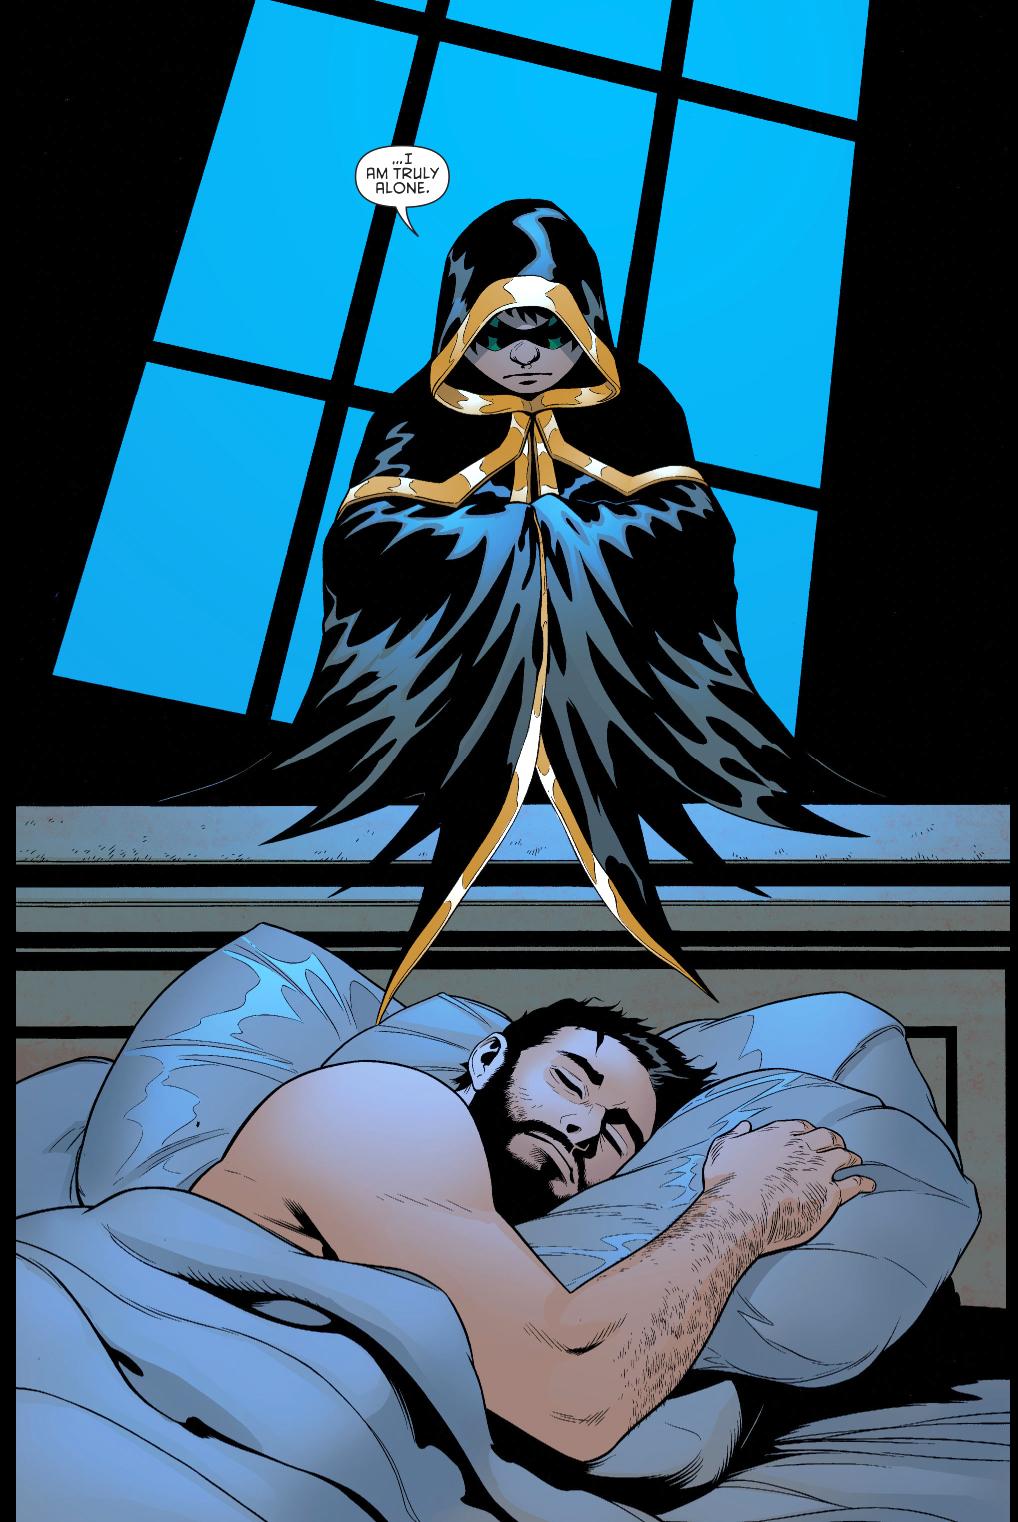 damian wayne's promise to batman